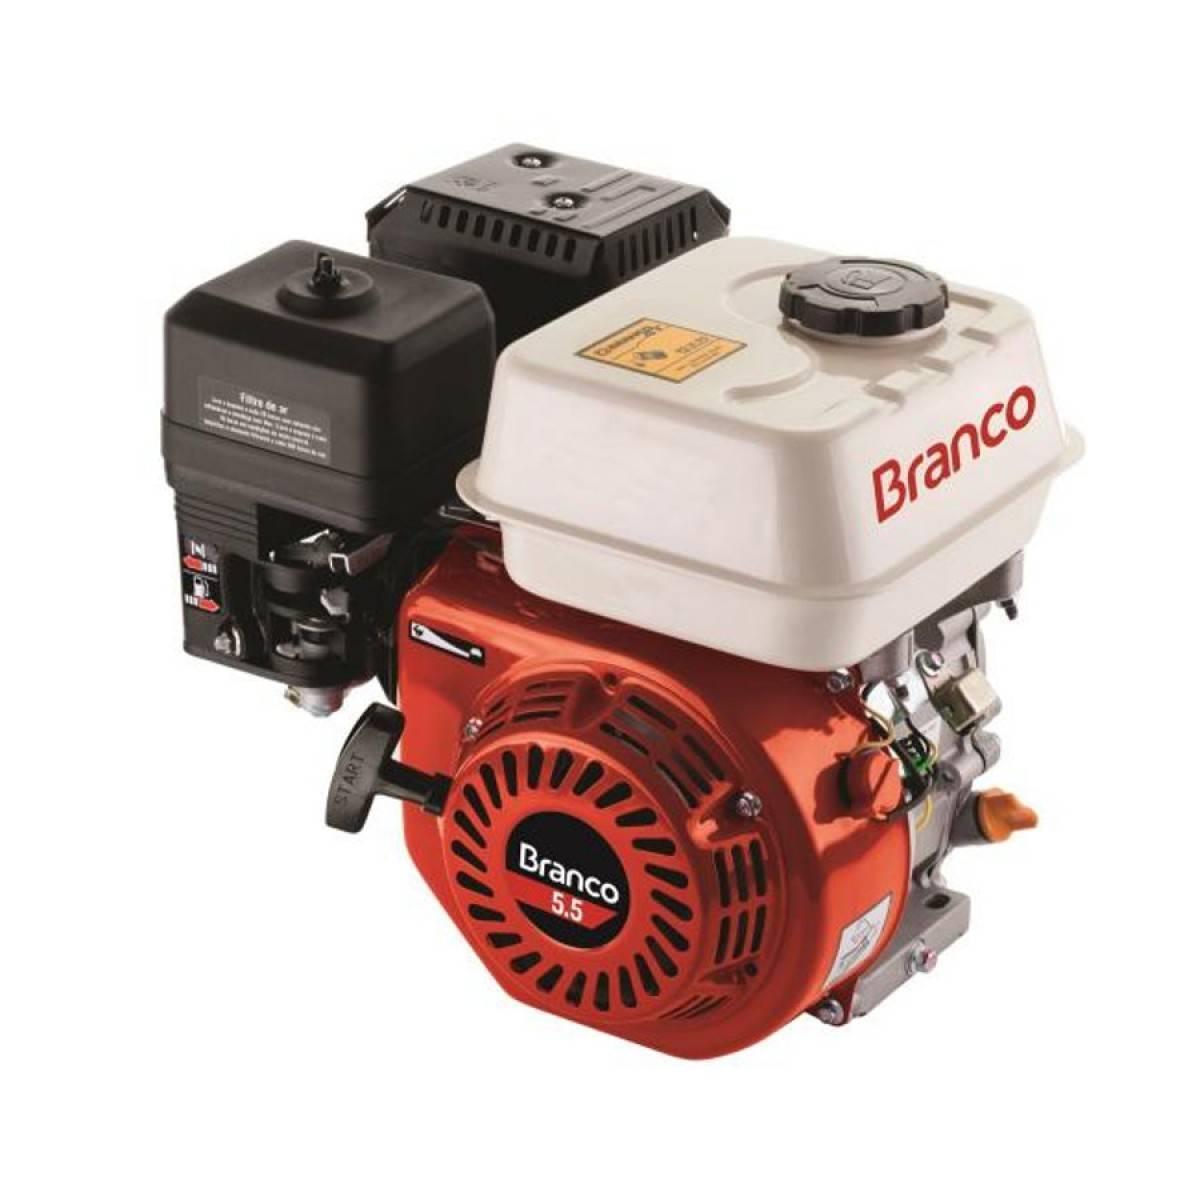 Motor Branco Gasolina B4T 7,0 CV Eixo H. P. Manual S/ alerta